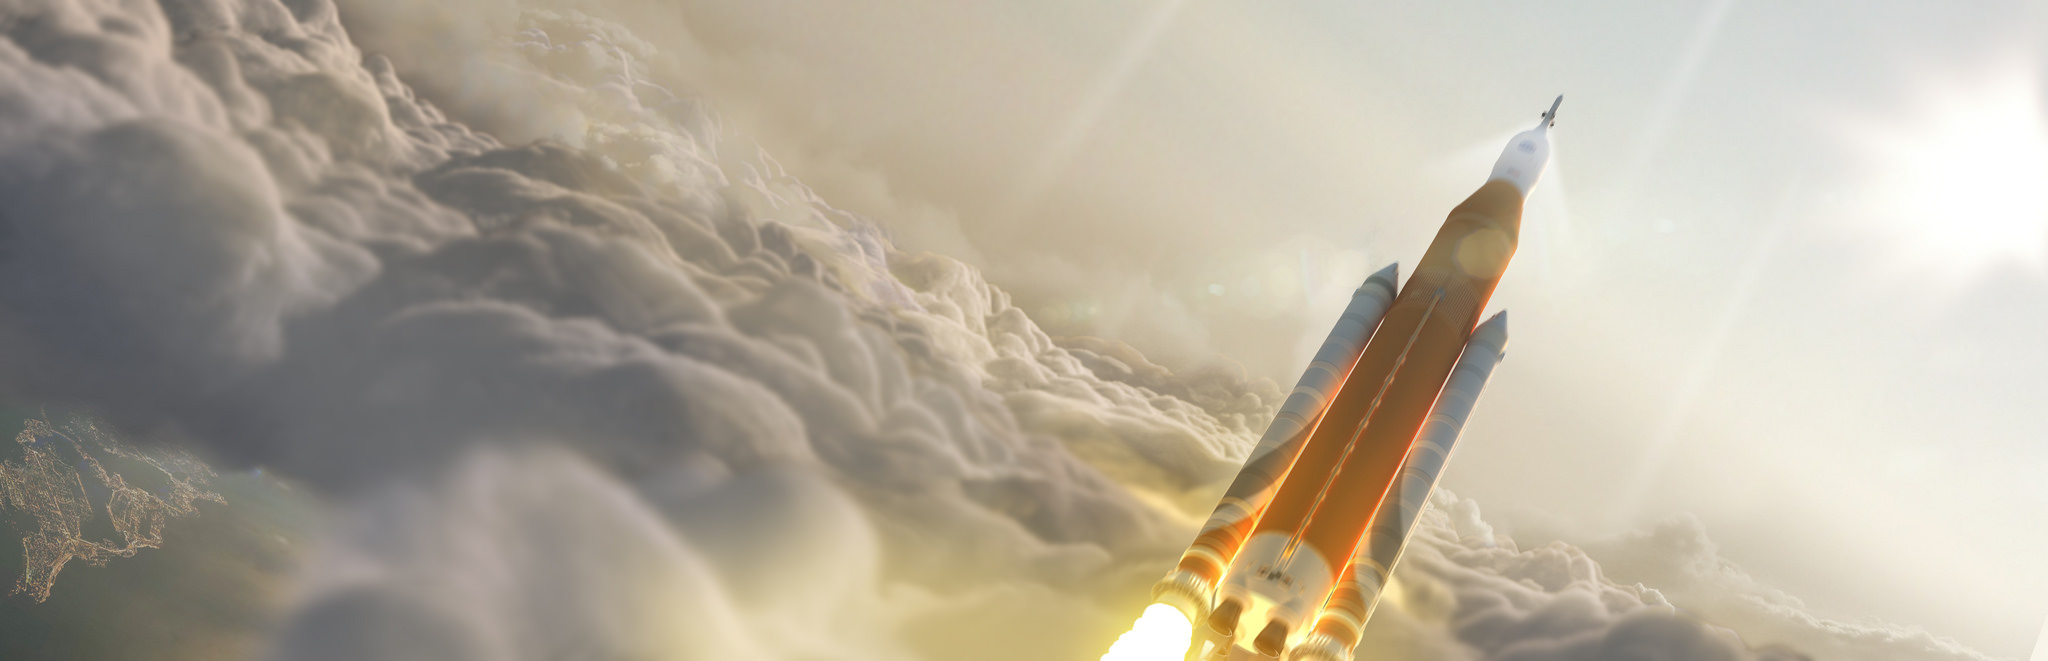 SLS roketine ait çizim. [NASA/MSFC]